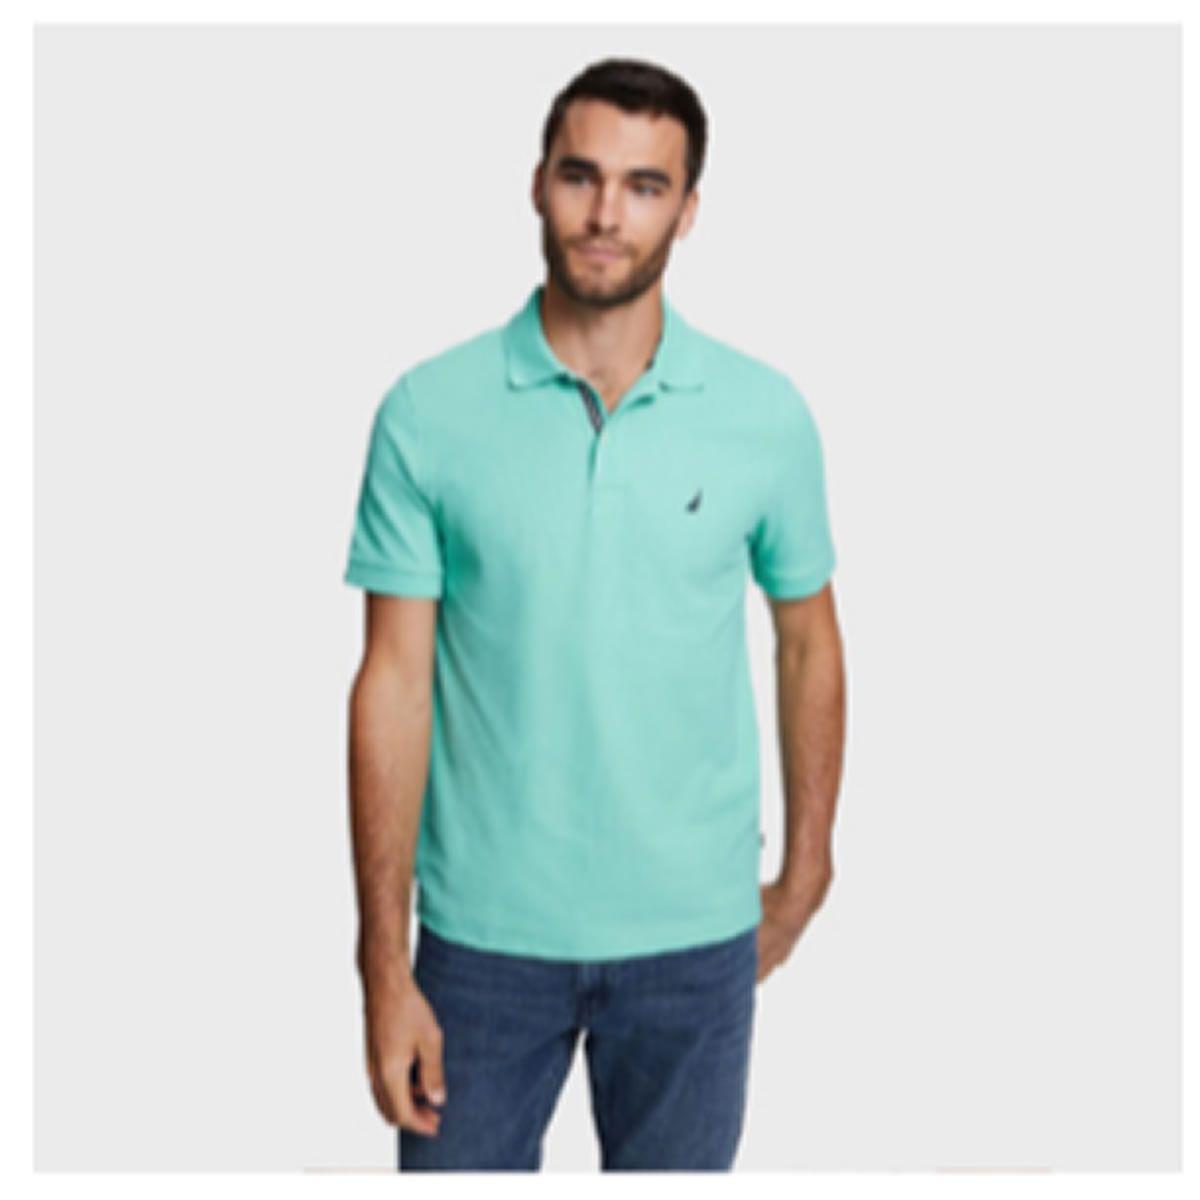 7c8966b4565 Nautica for Men - Men s Clothing - Macy s